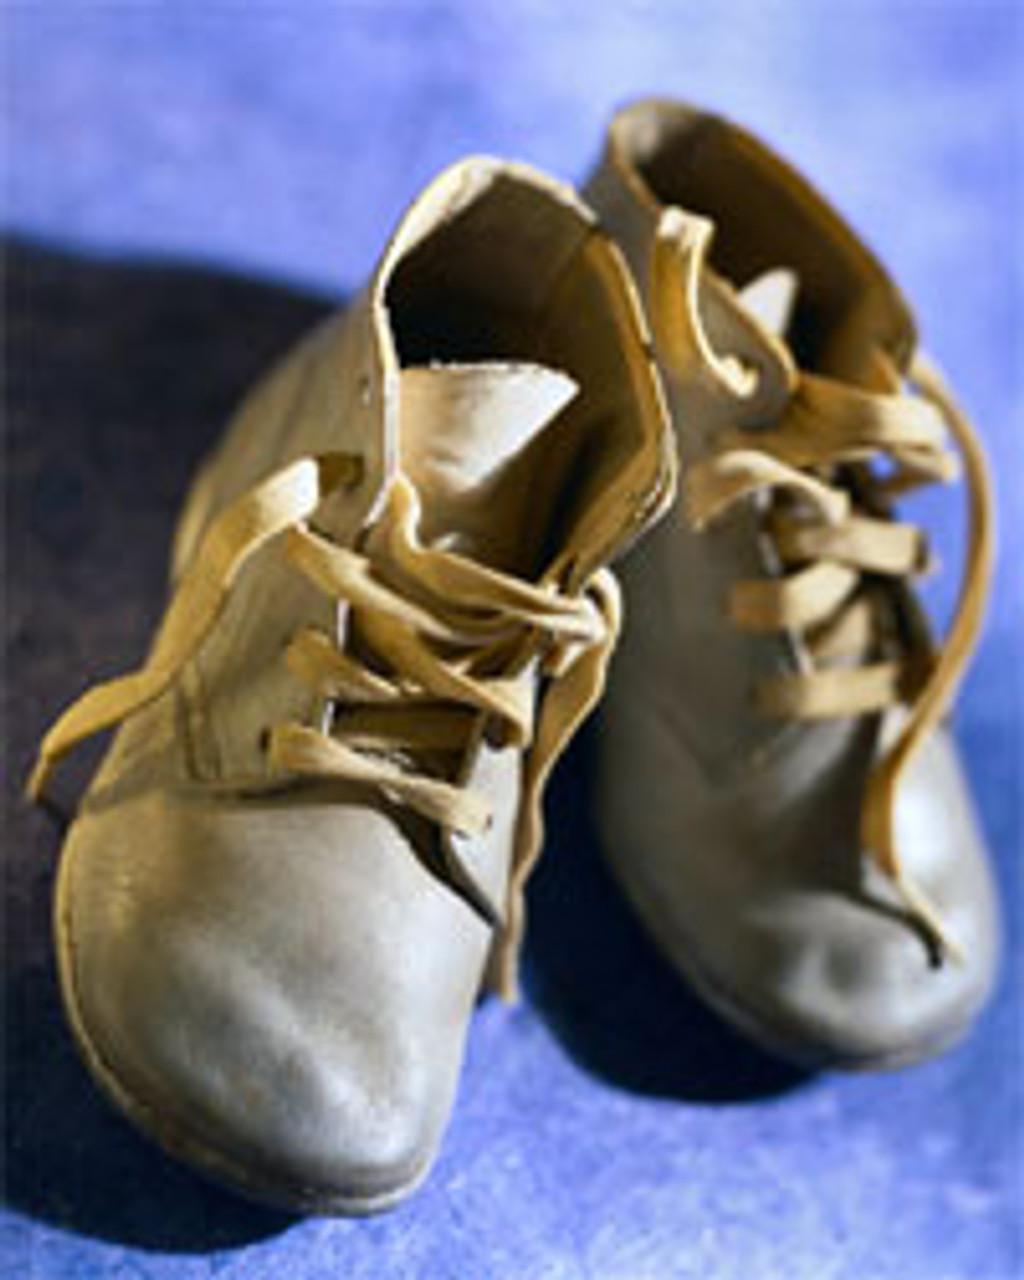 Complete Baby Shoe Bronzing Kit